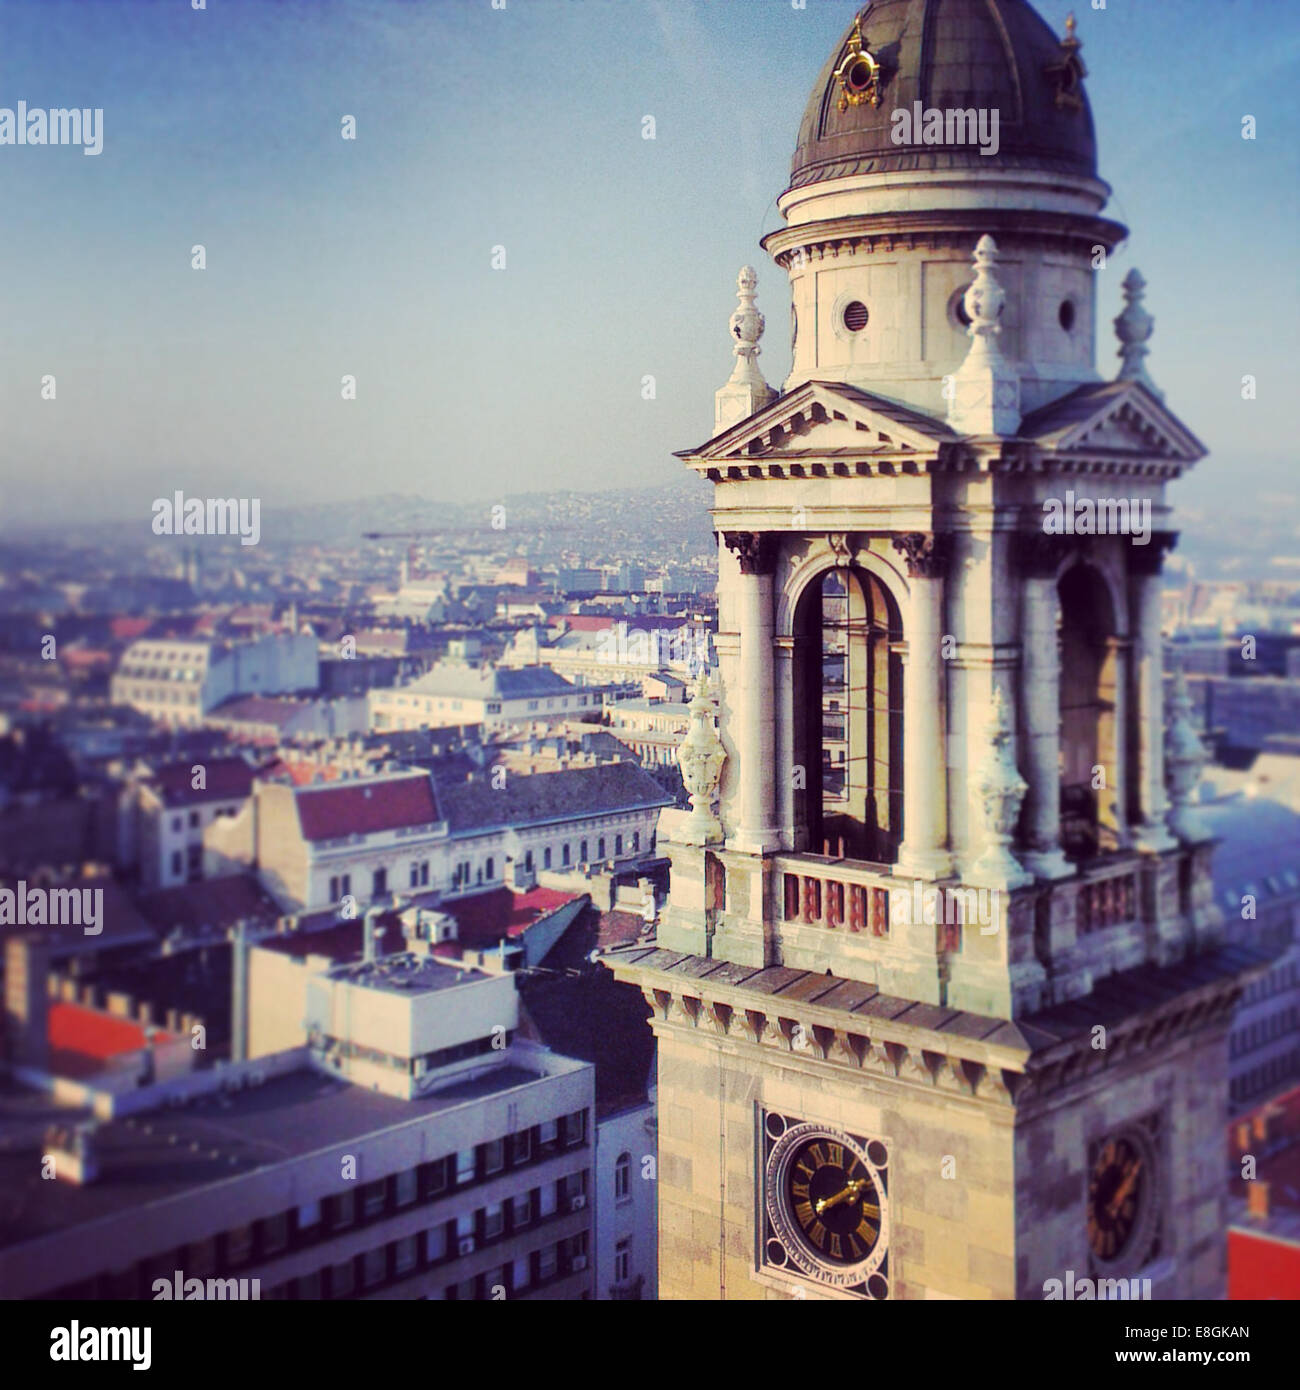 Budapest, Hungary Budapest In Hungary - Stock Image